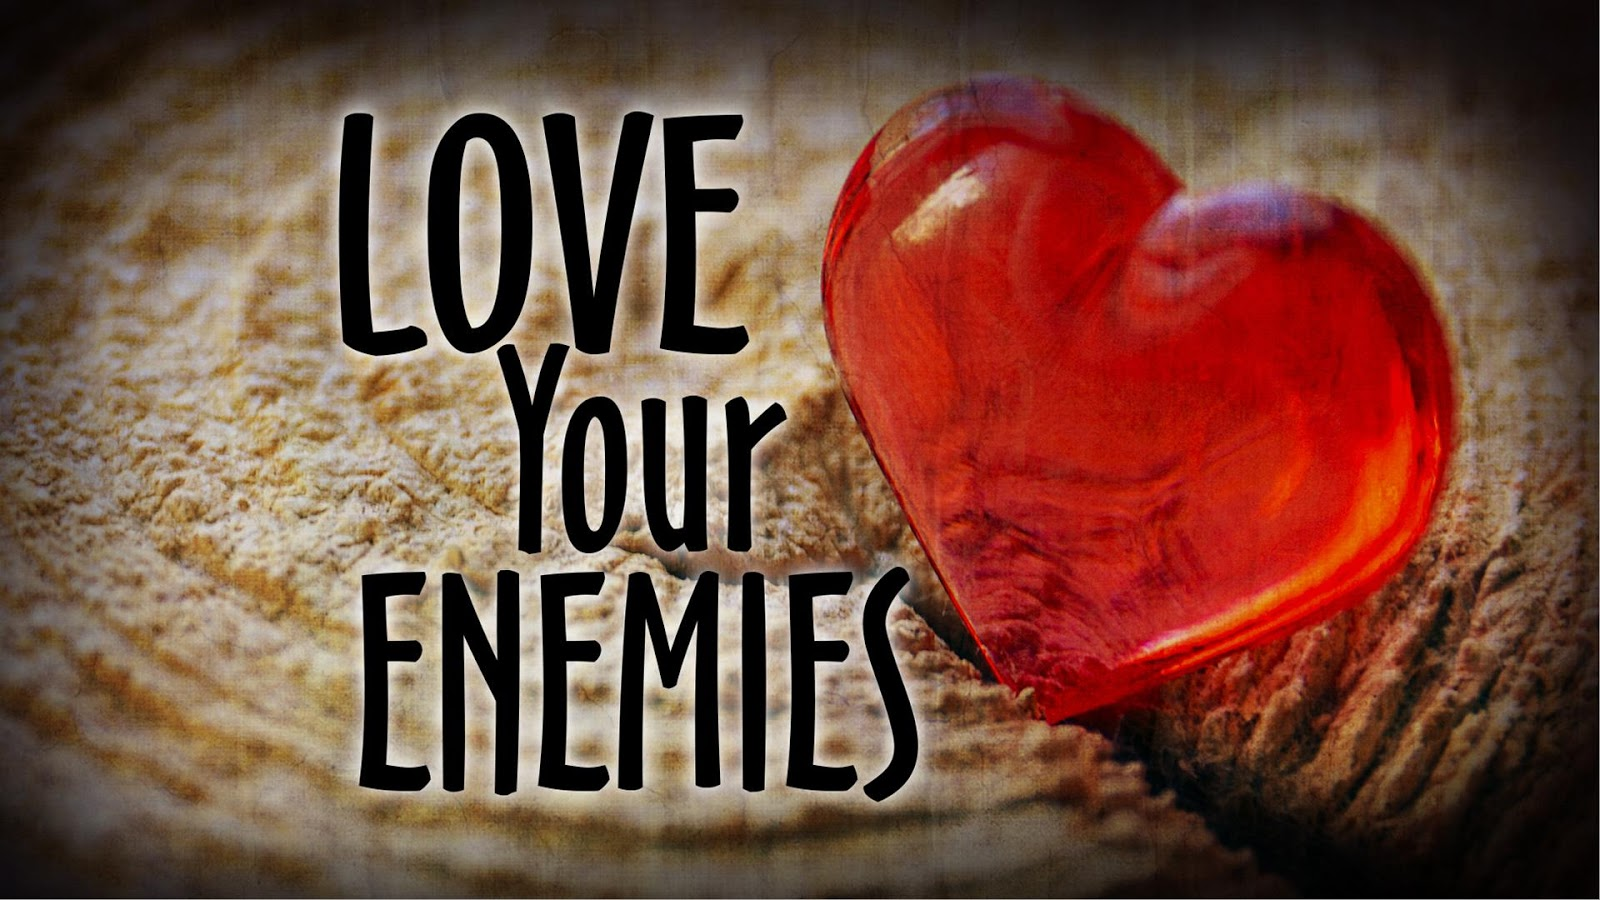 The Merry Catholic: Love Enemies? You Gotta Be Kidding!